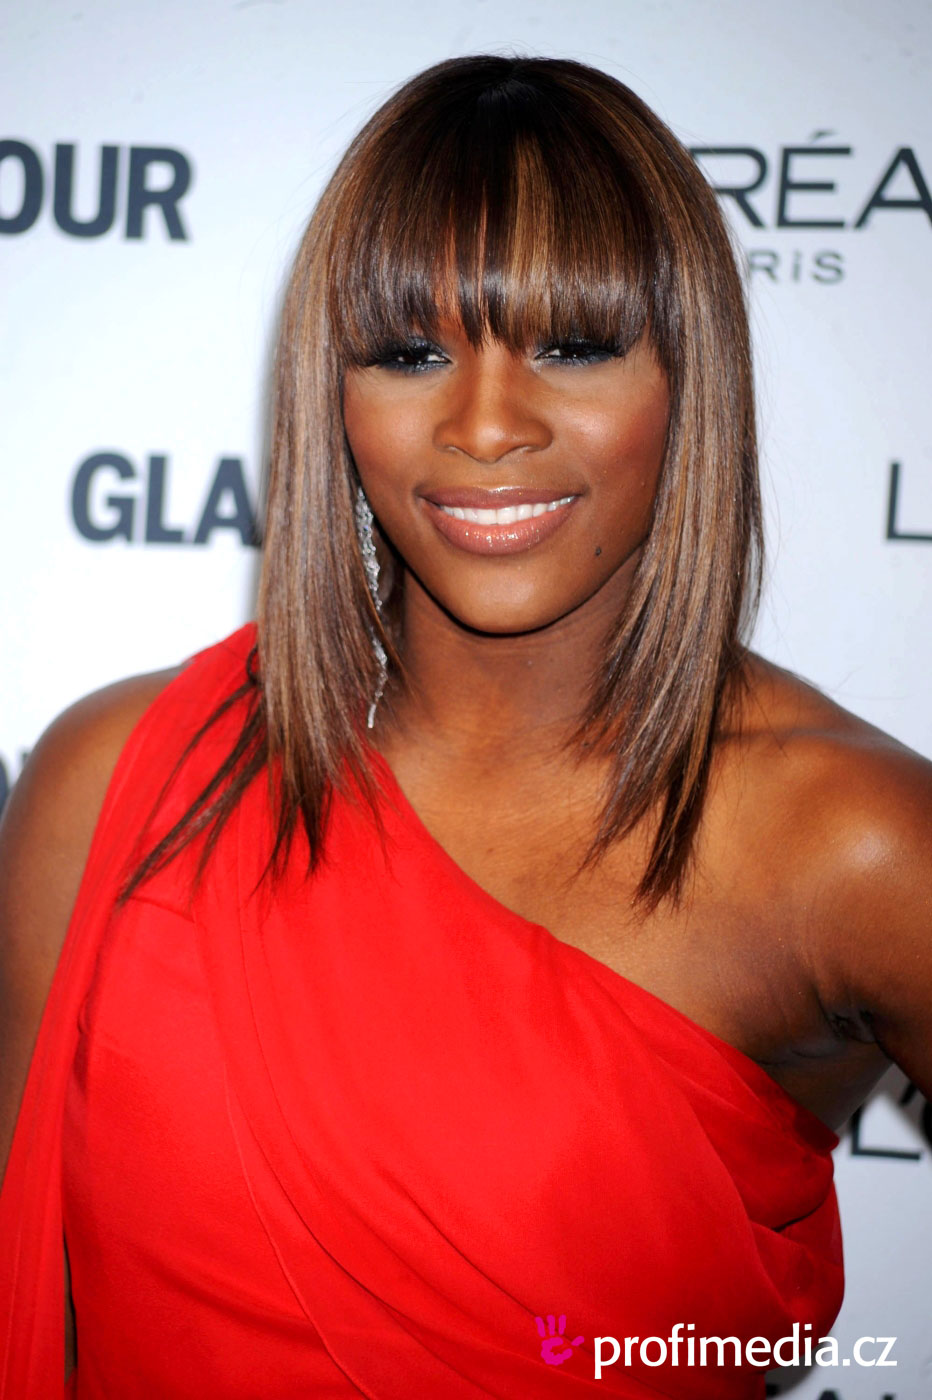 Prom hairstyle - Serena Williams - Serena Williams